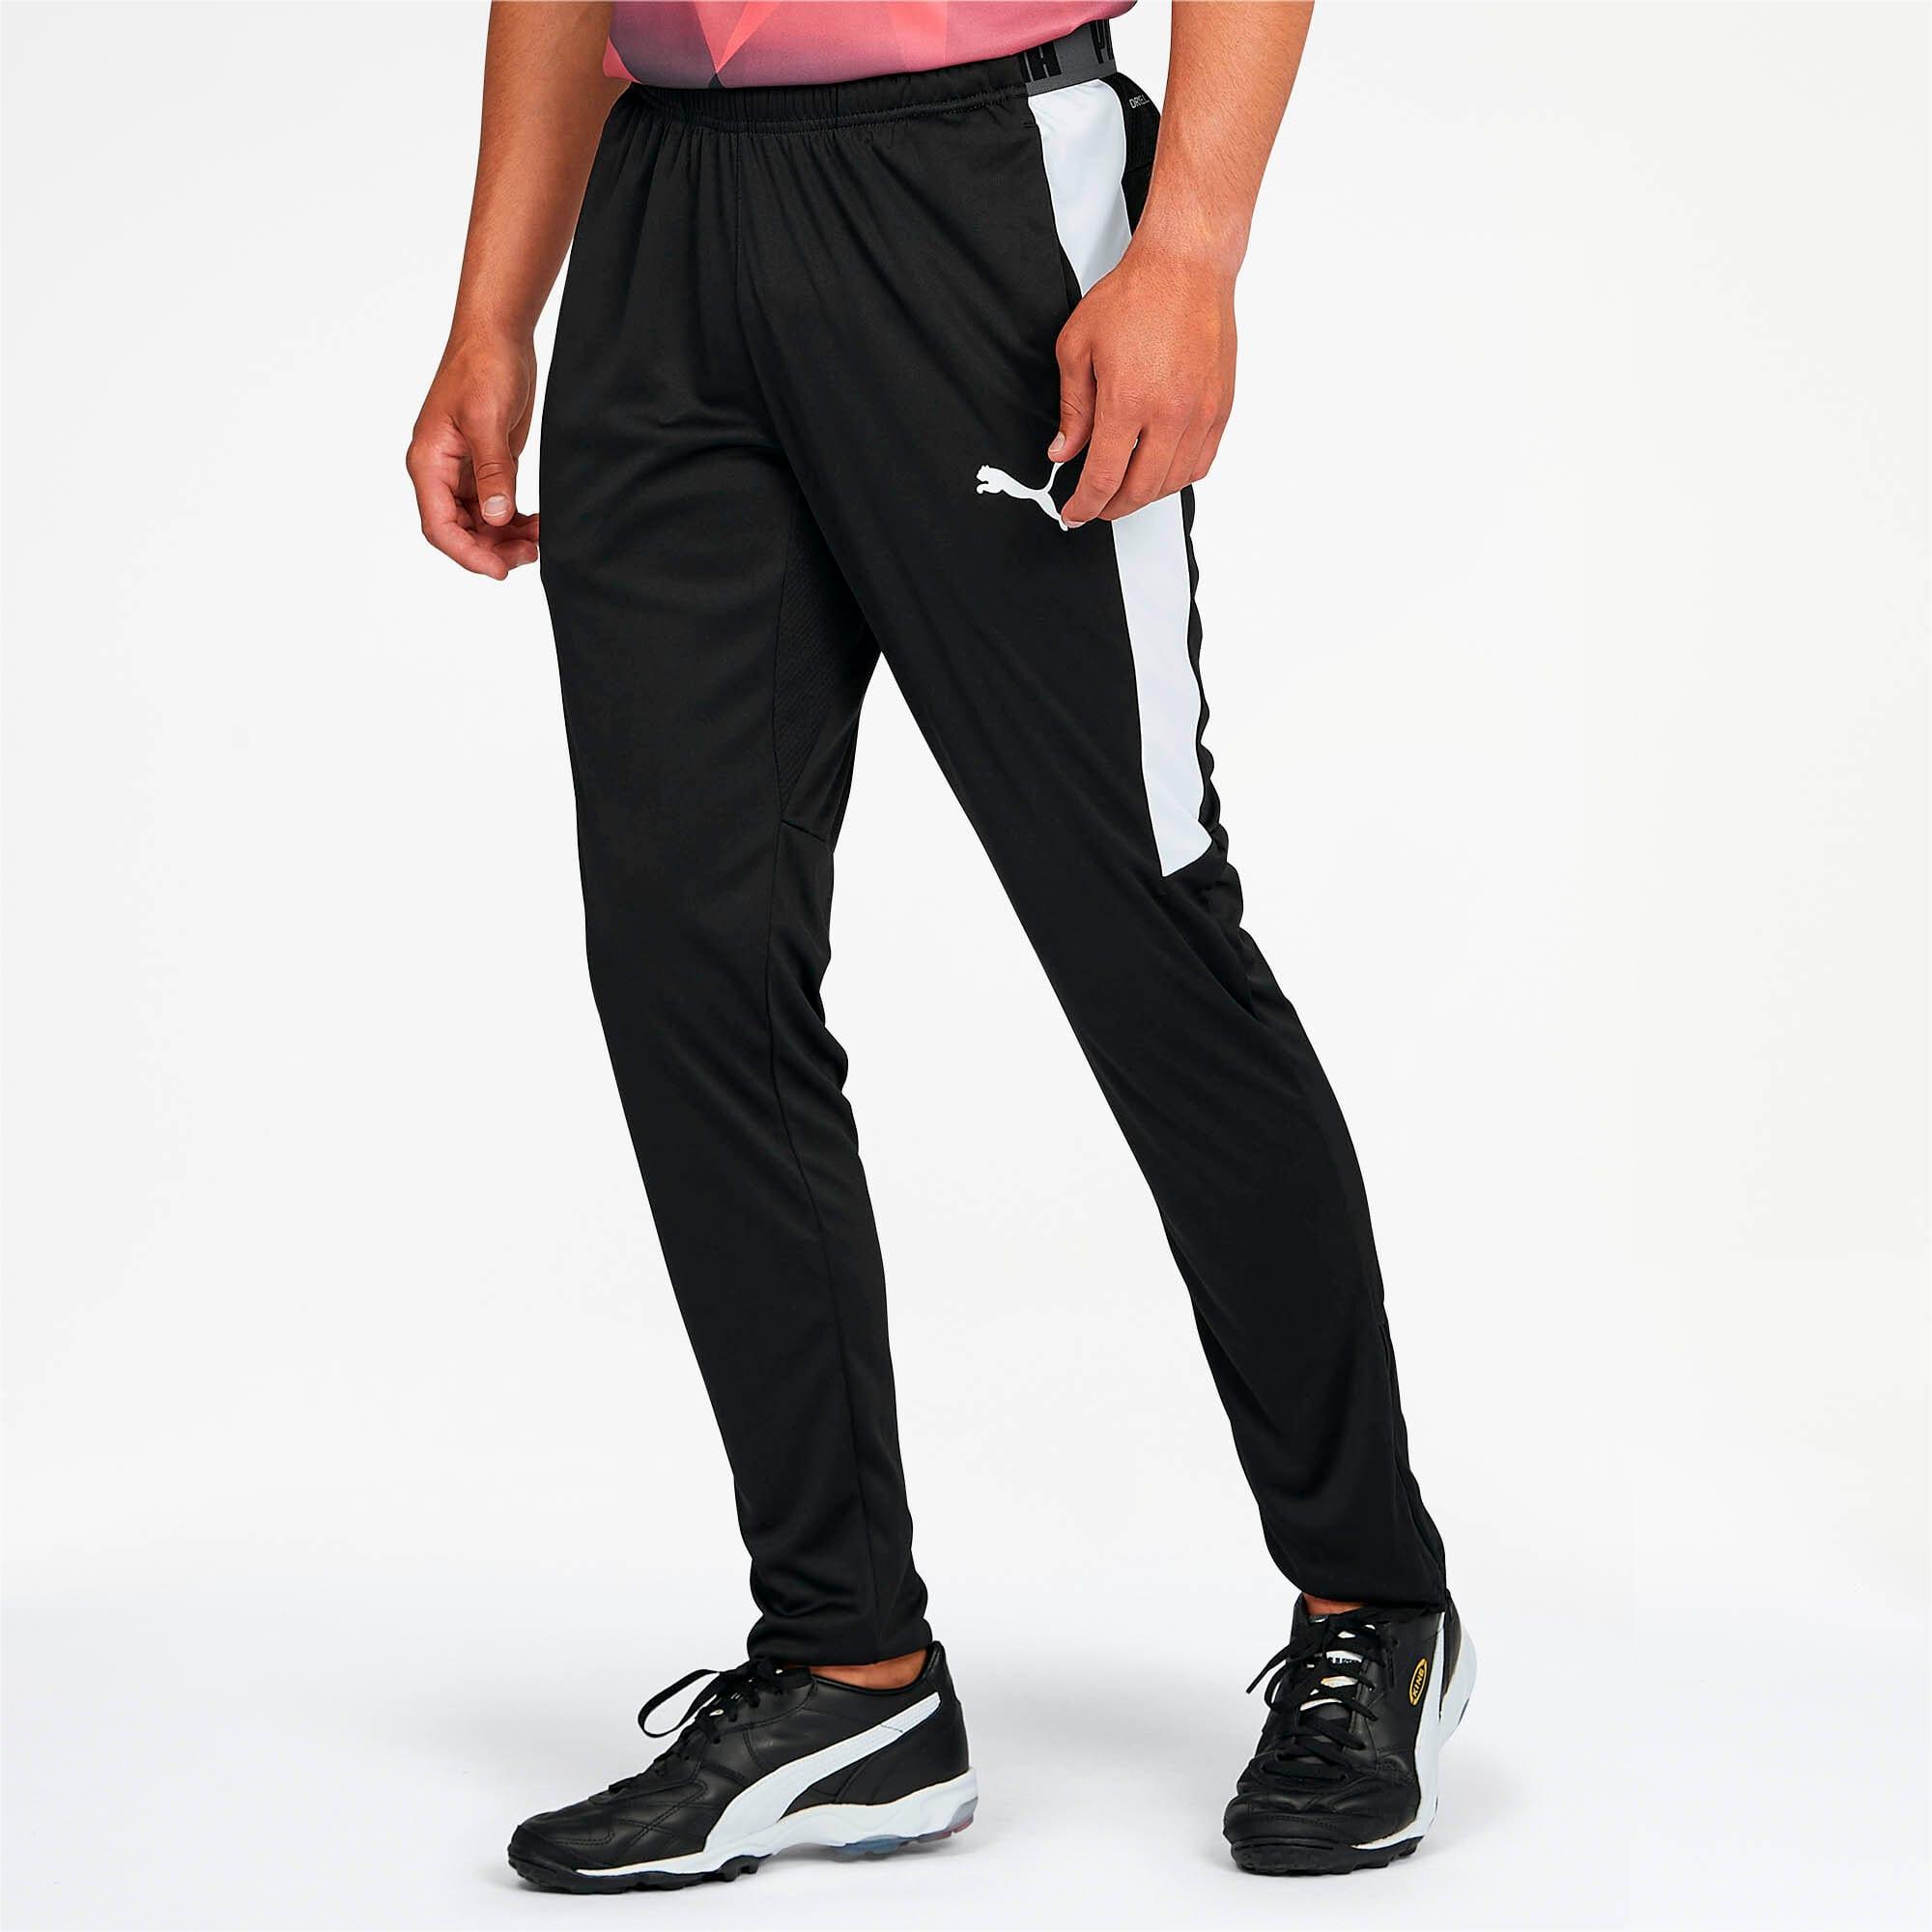 Thumbnail 1 of Men's Speed Pants, Puma Black-Puma White, medium